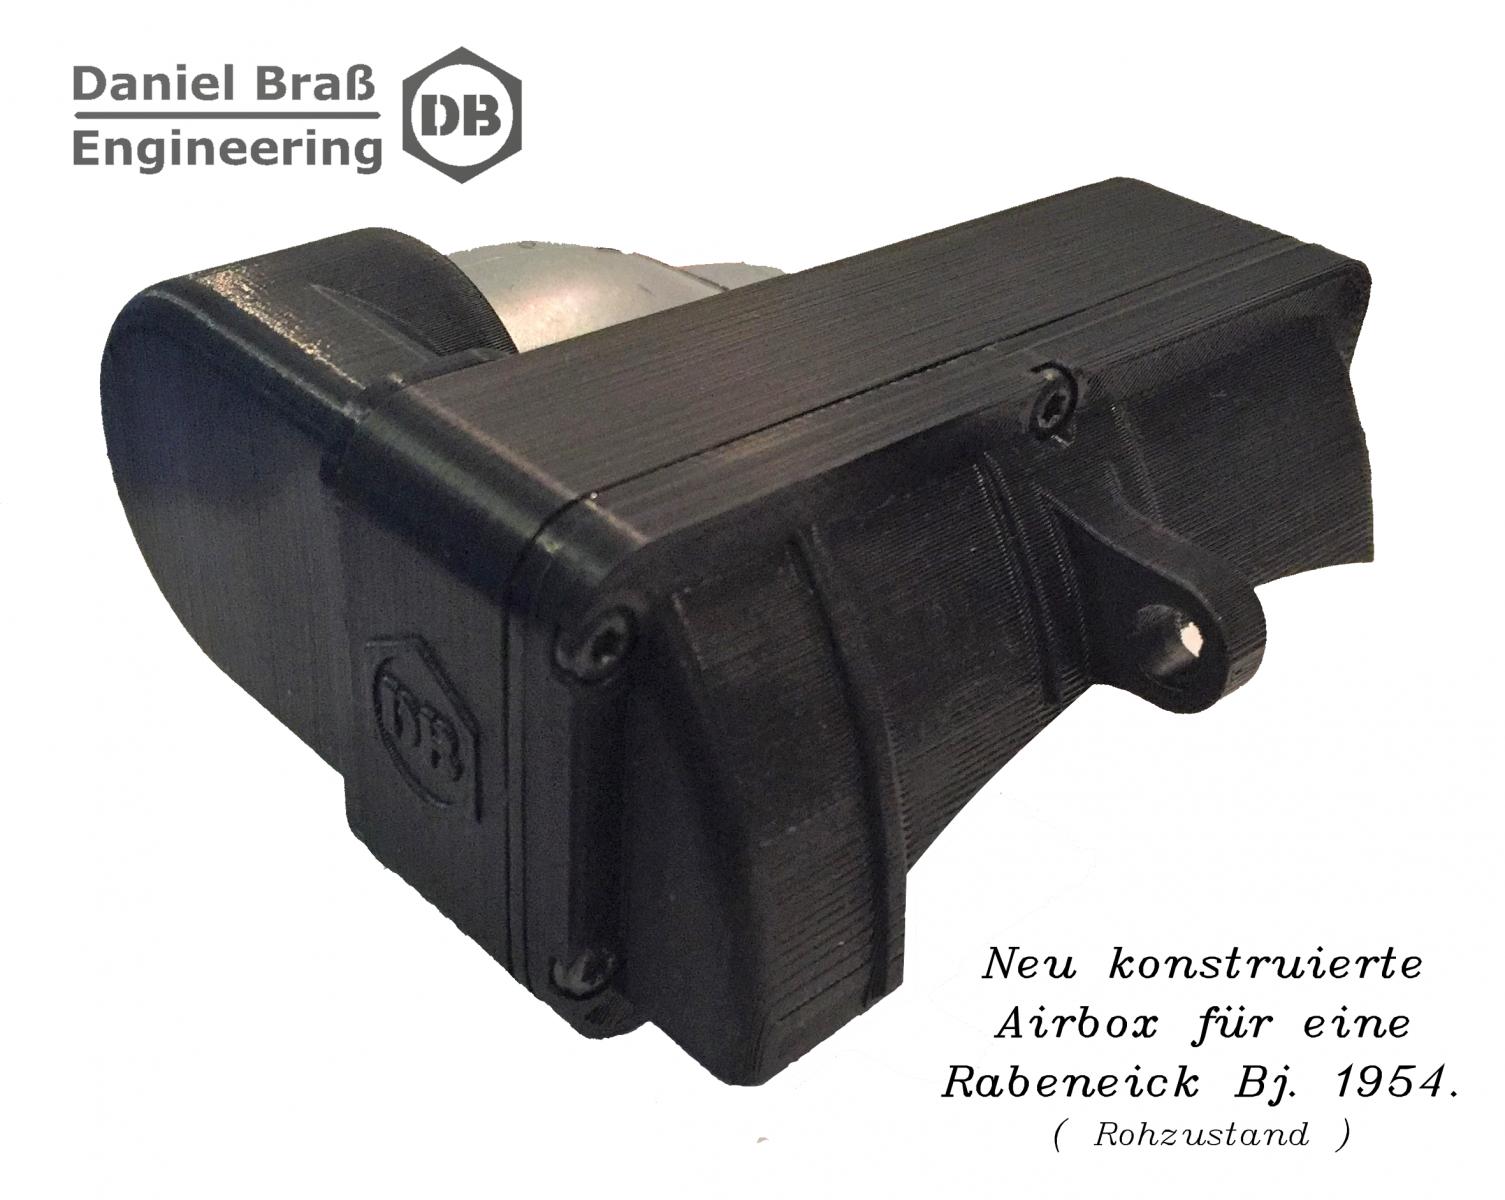 Rabeneick Airbox